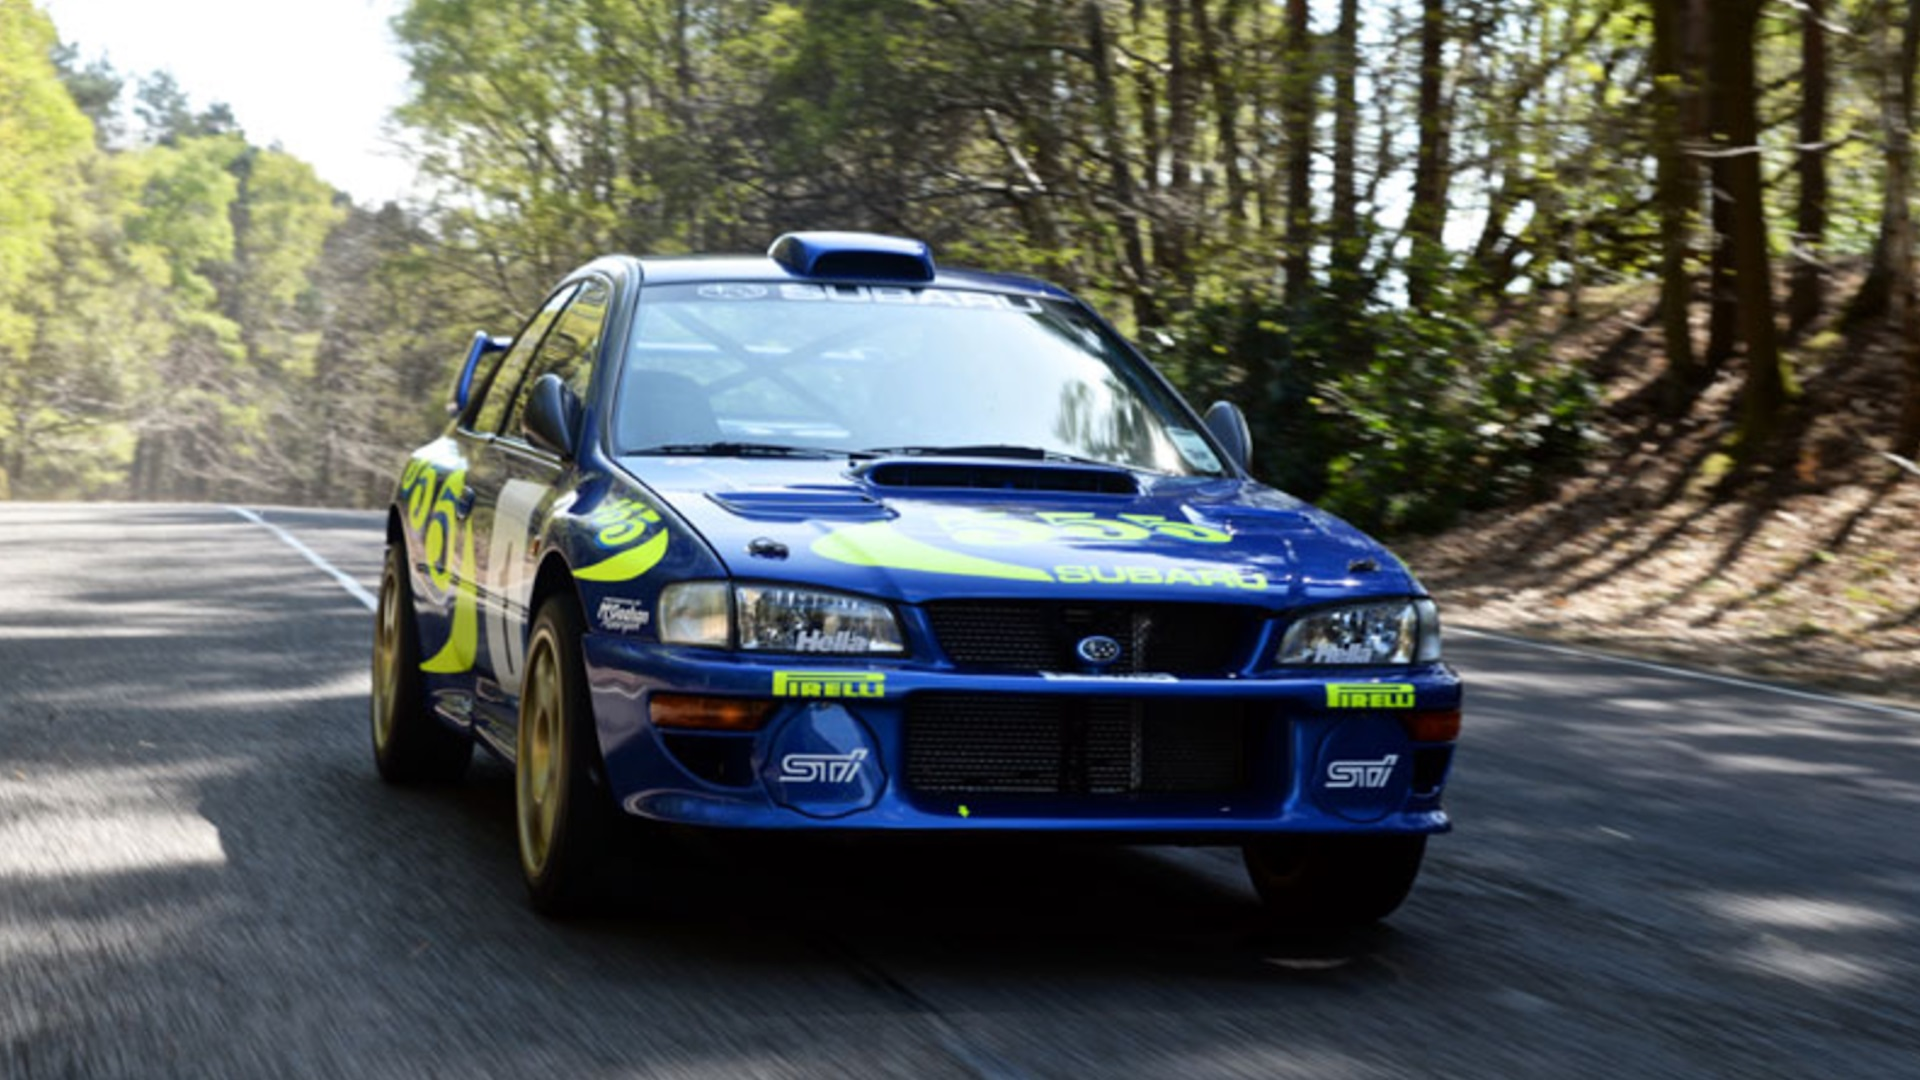 Subaru Impreza WRC Test Car Colin McRae (1)